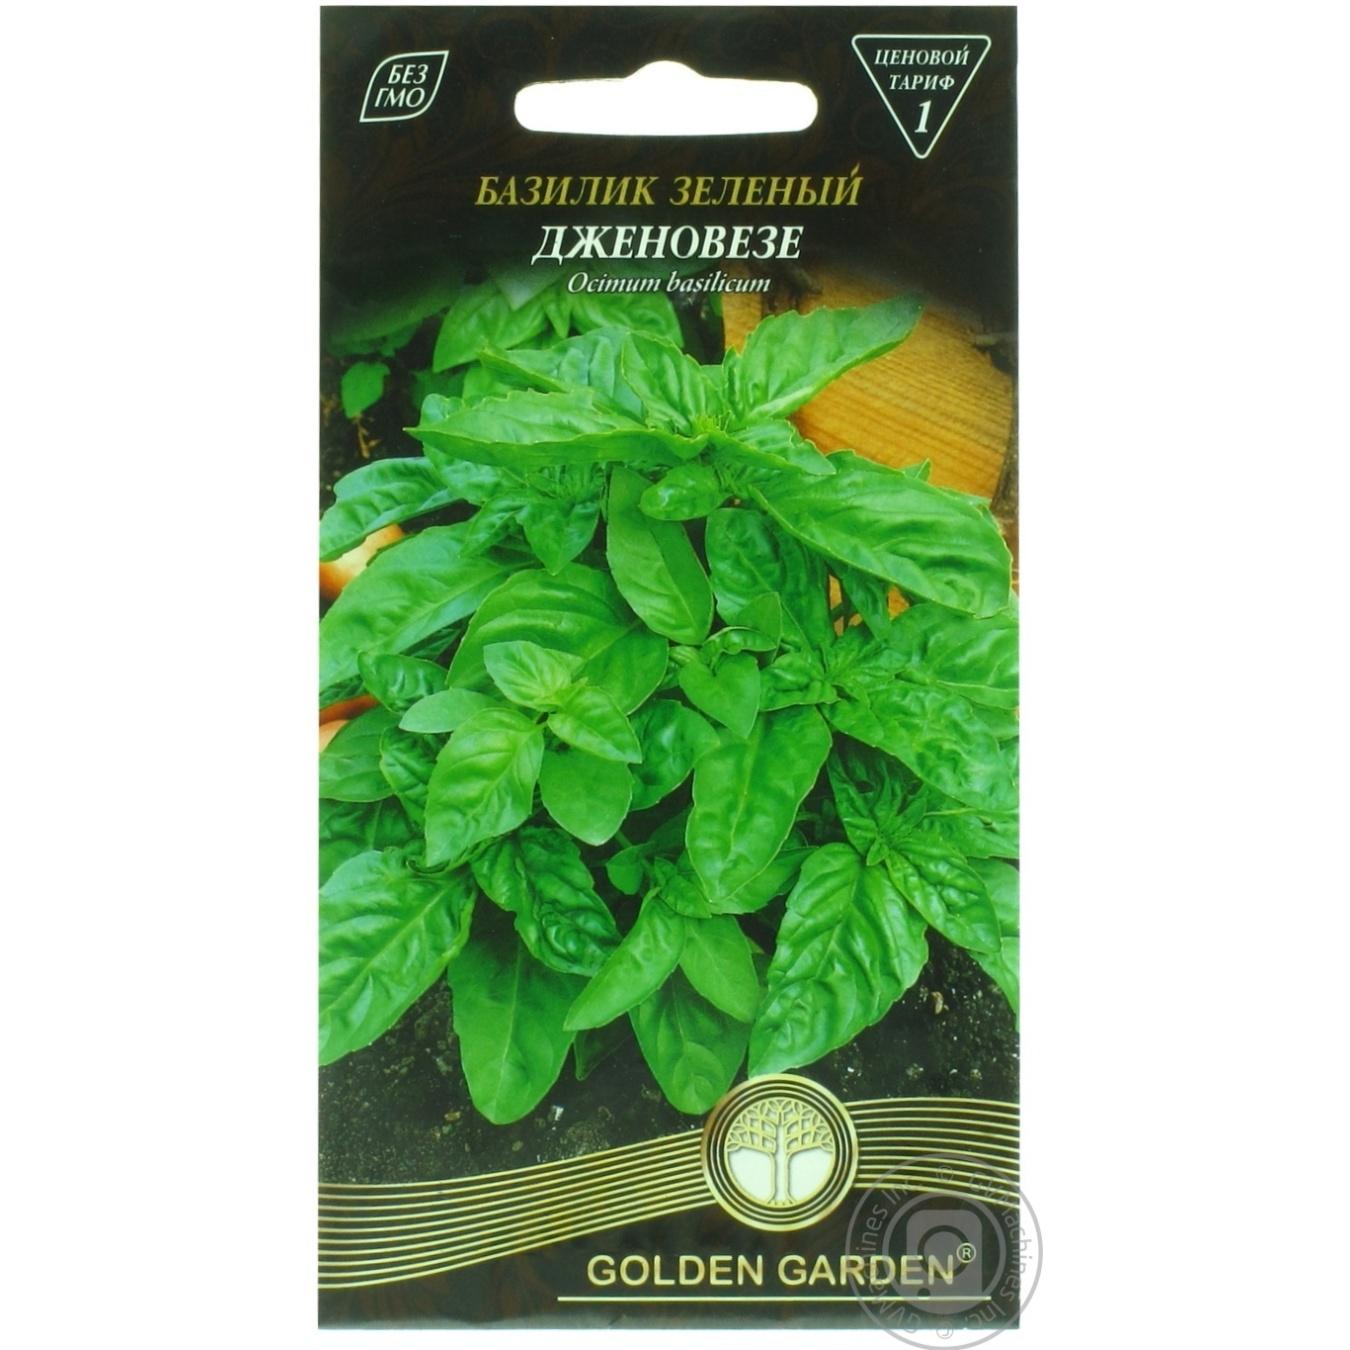 Насіння Базилік зелений Дженовезе Golden Garden 0 aabefddaa5238